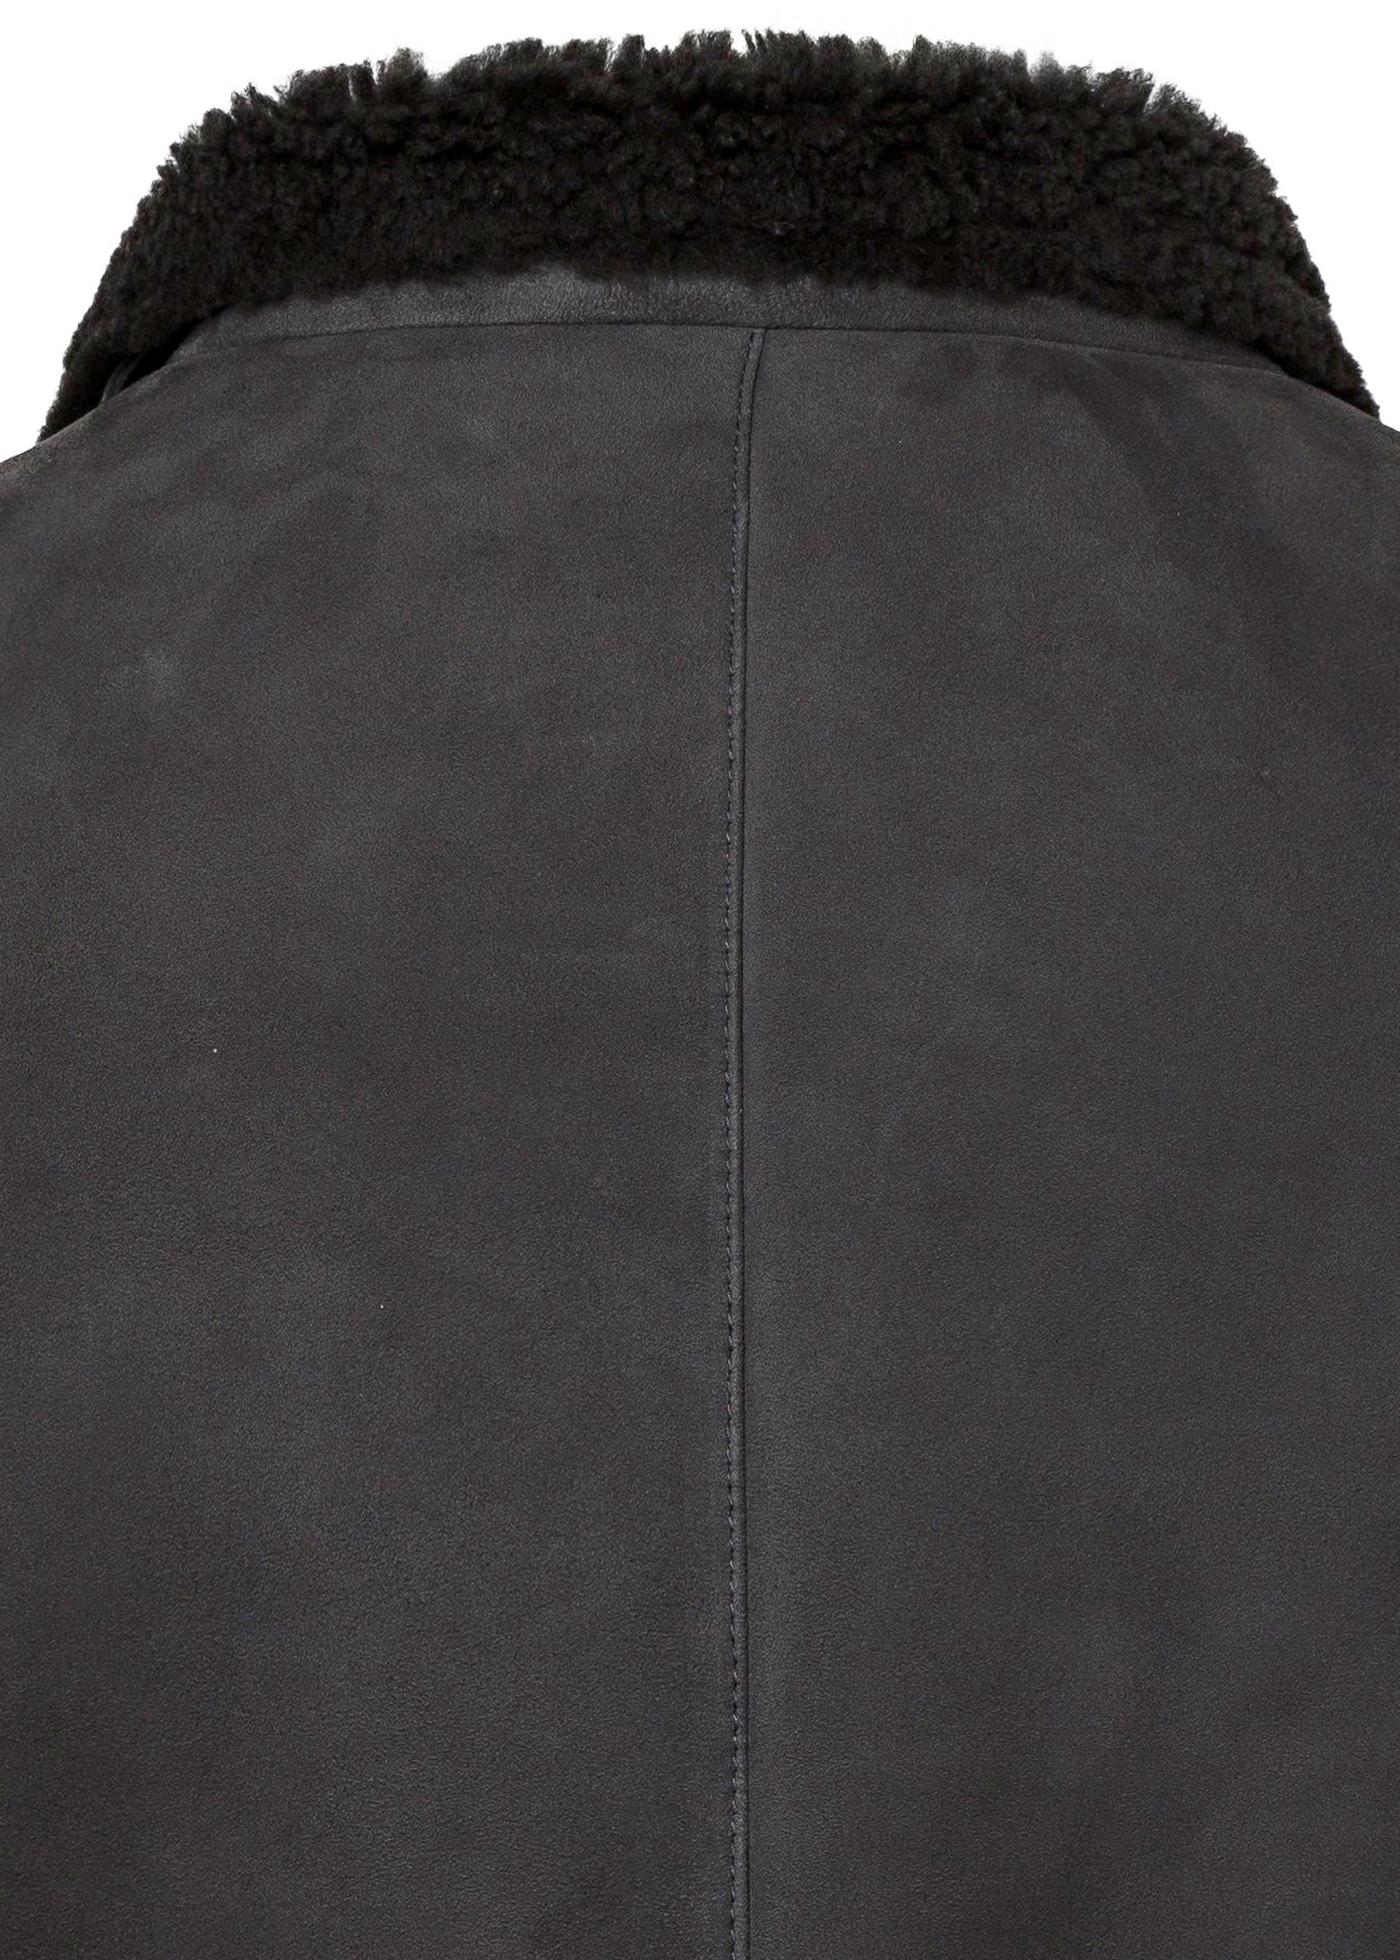 leather jacket Antola DF image number 3